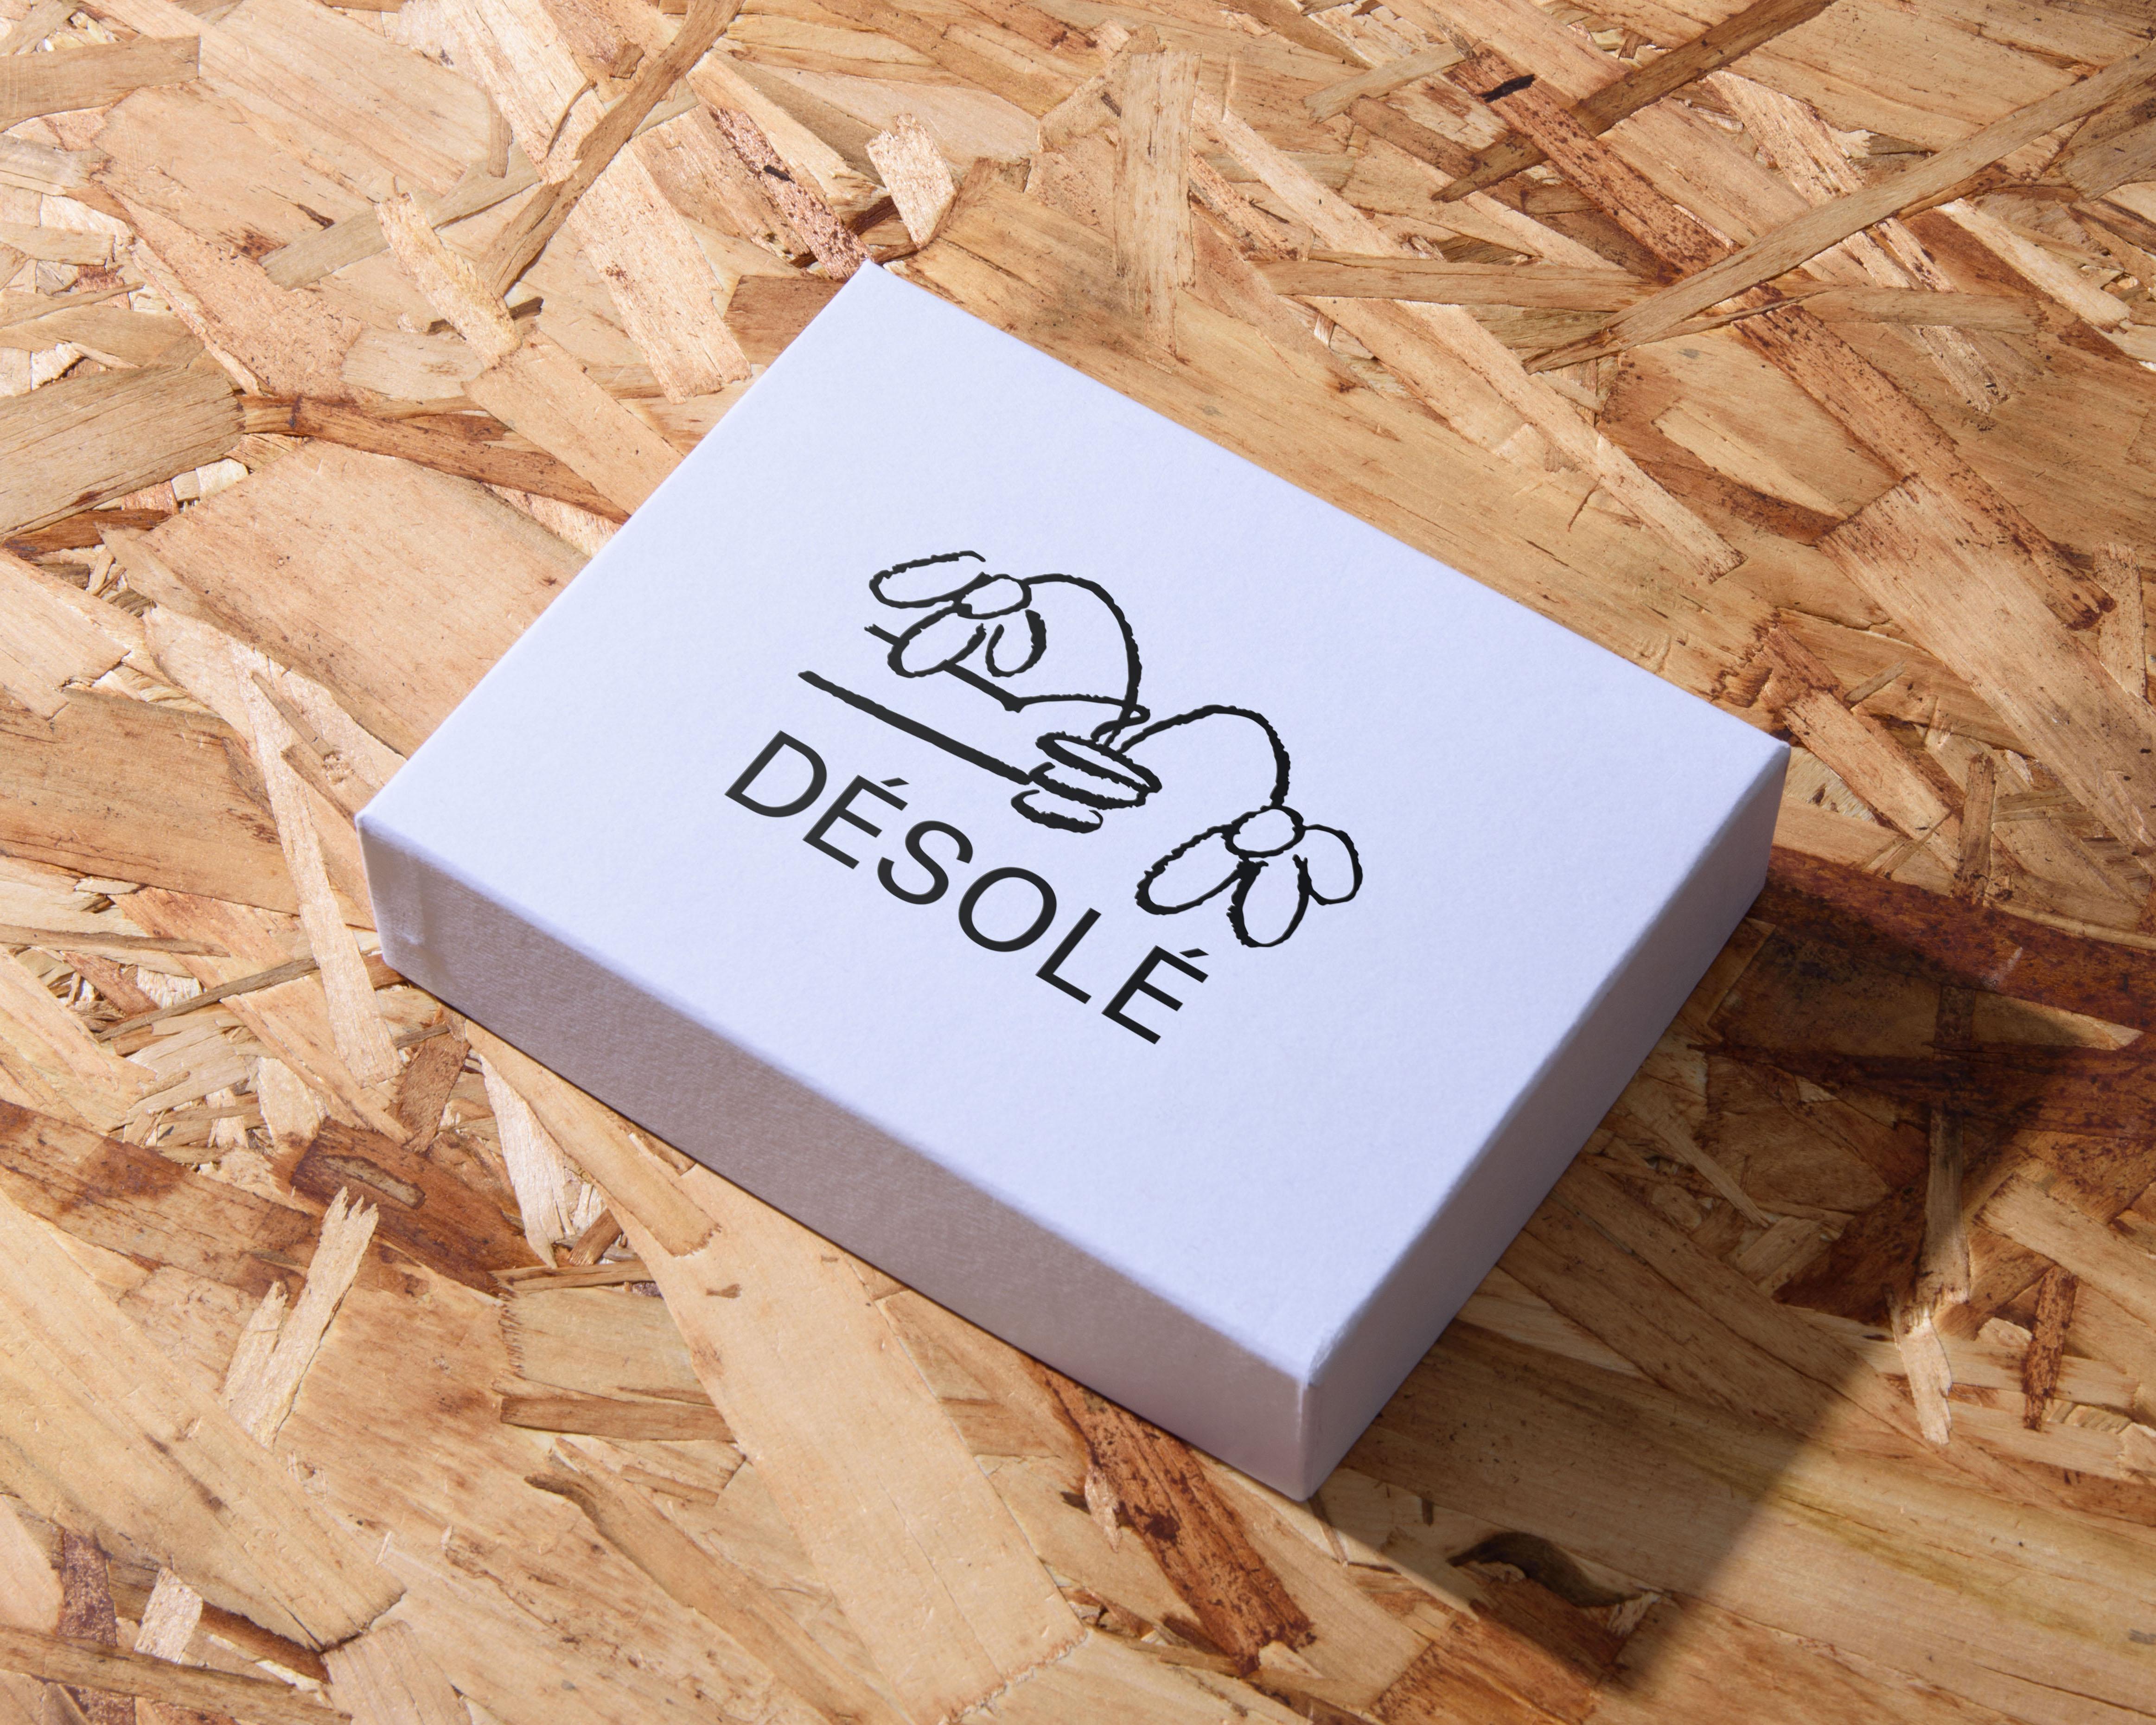 Désolé Branding Packaging on White Box